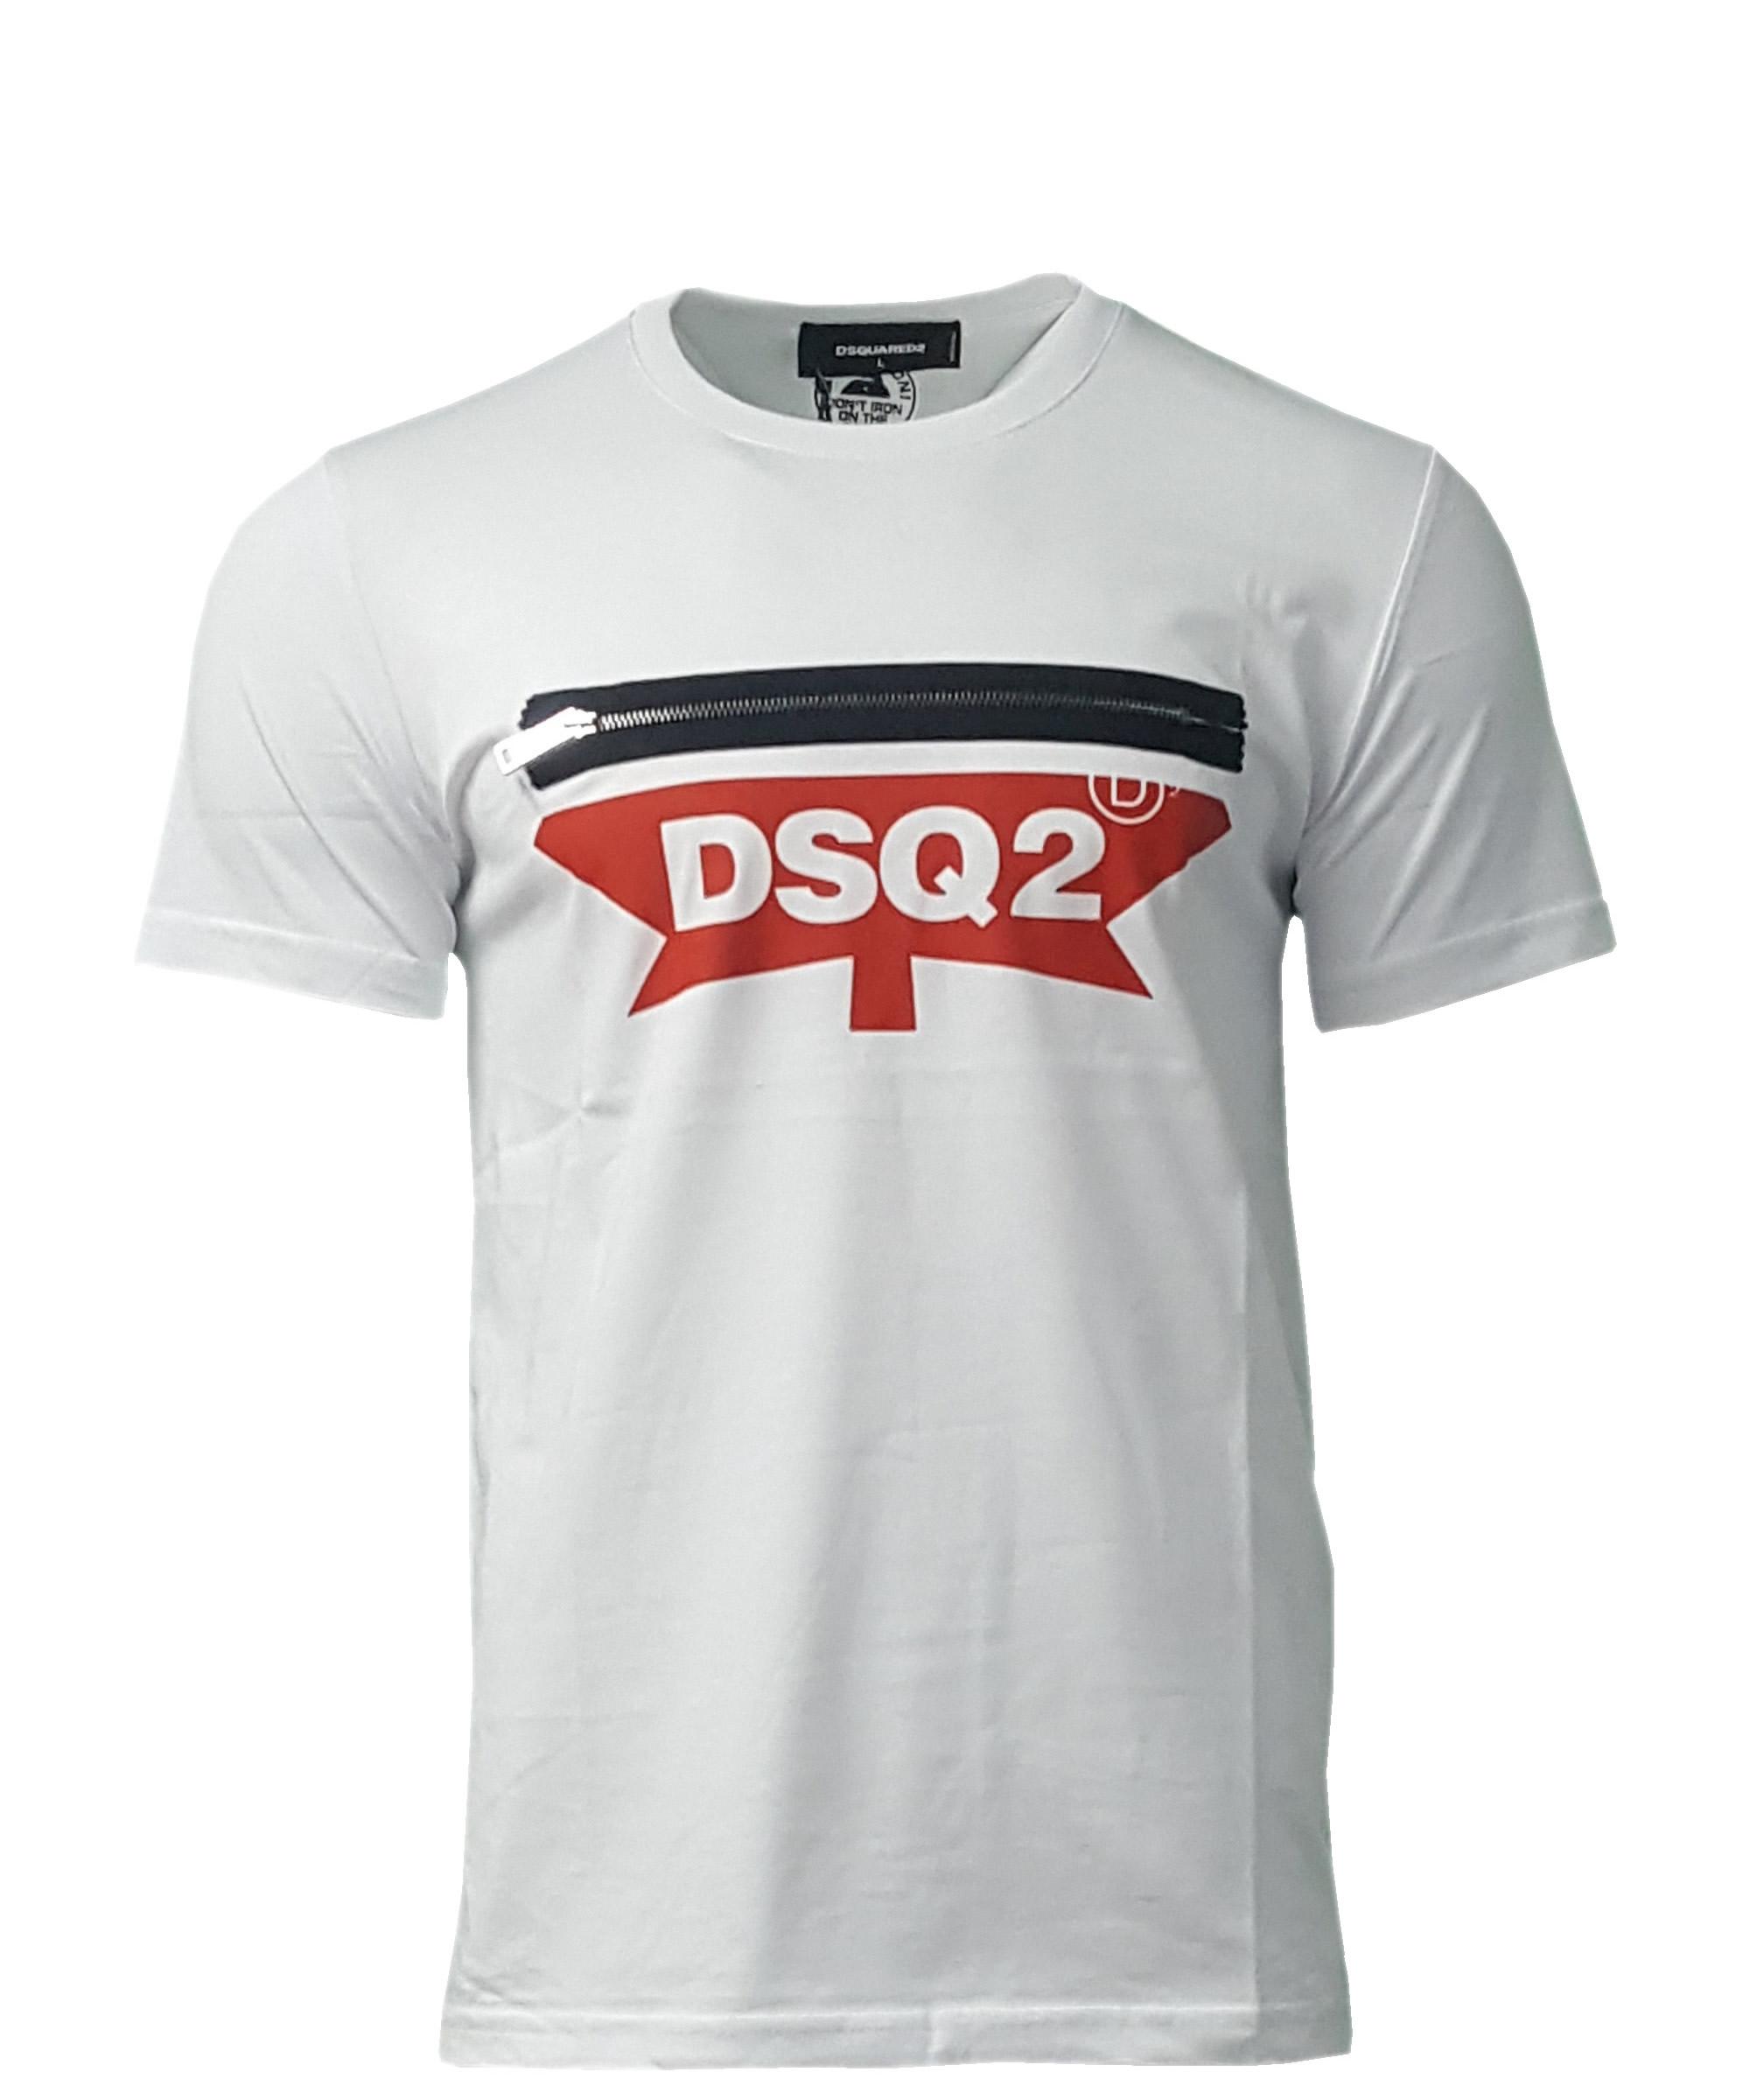 168abc71254b Dsquared2 Men's Crew Neck T Shirt. Maple Leaf Print in White ...